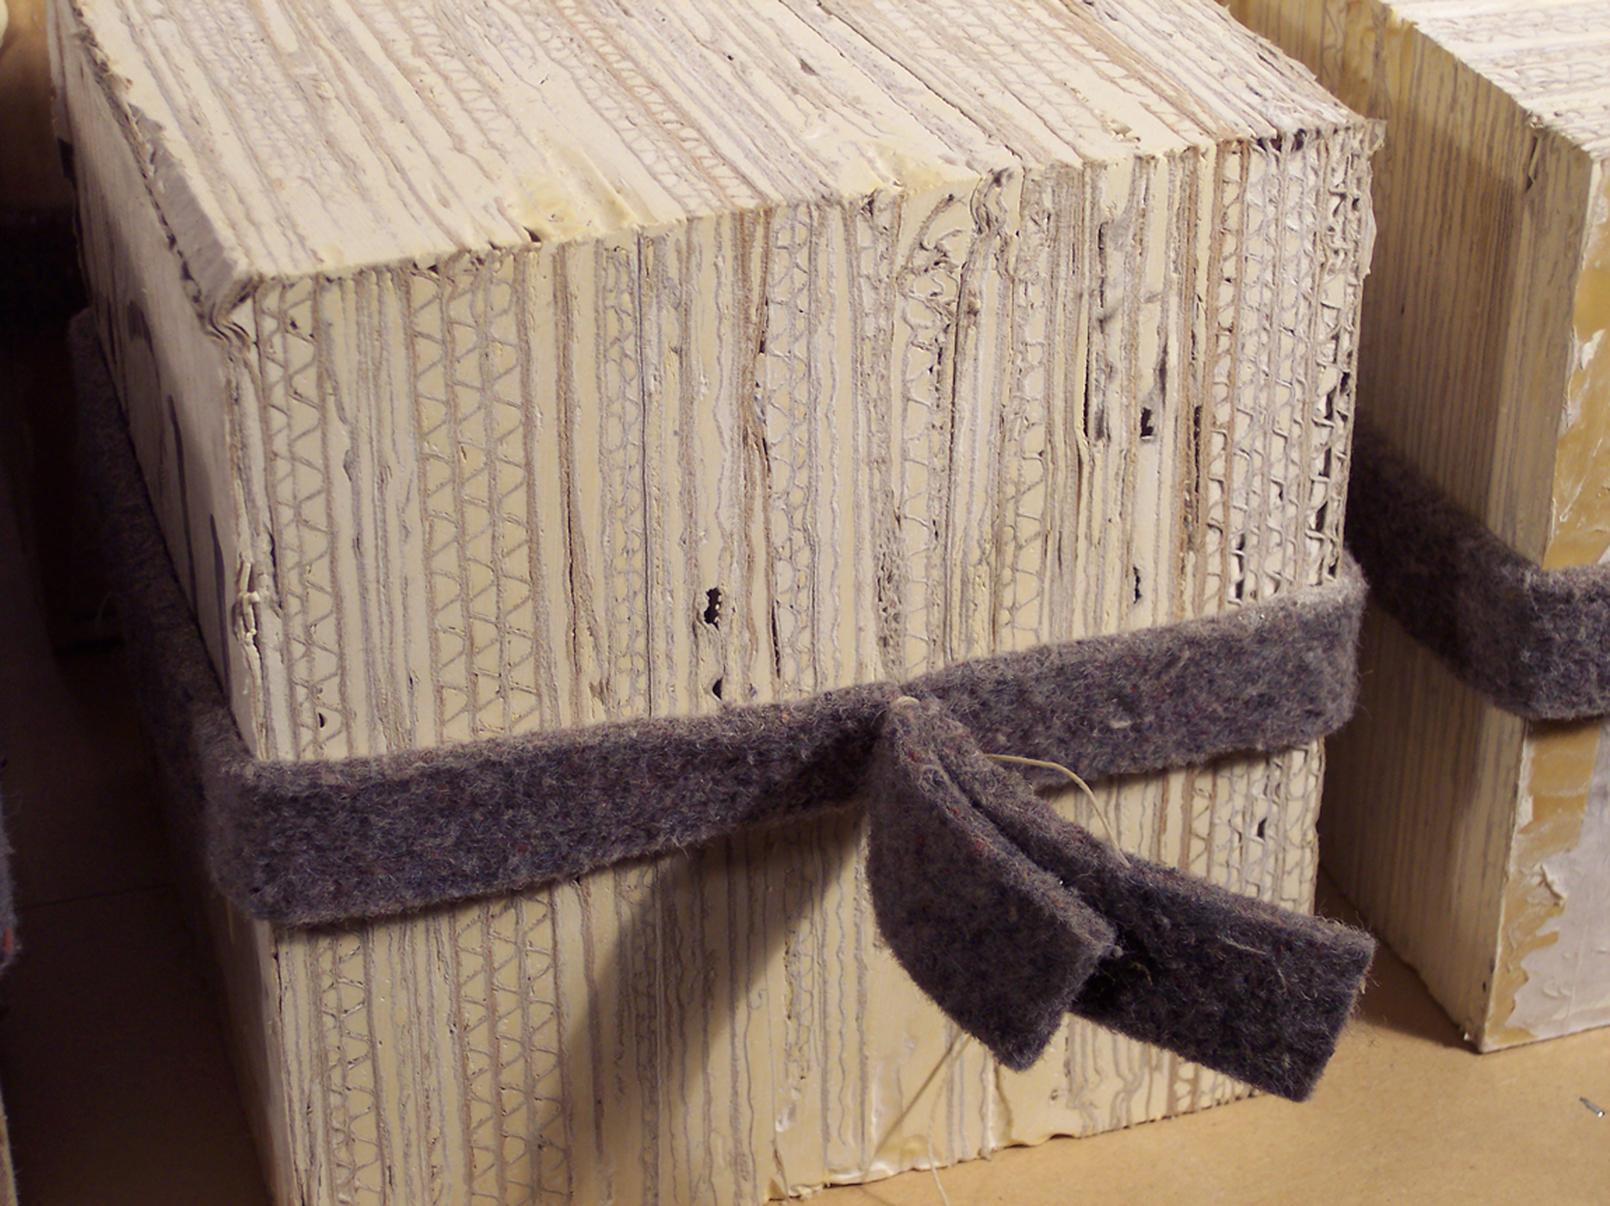 Moving Box (detail)